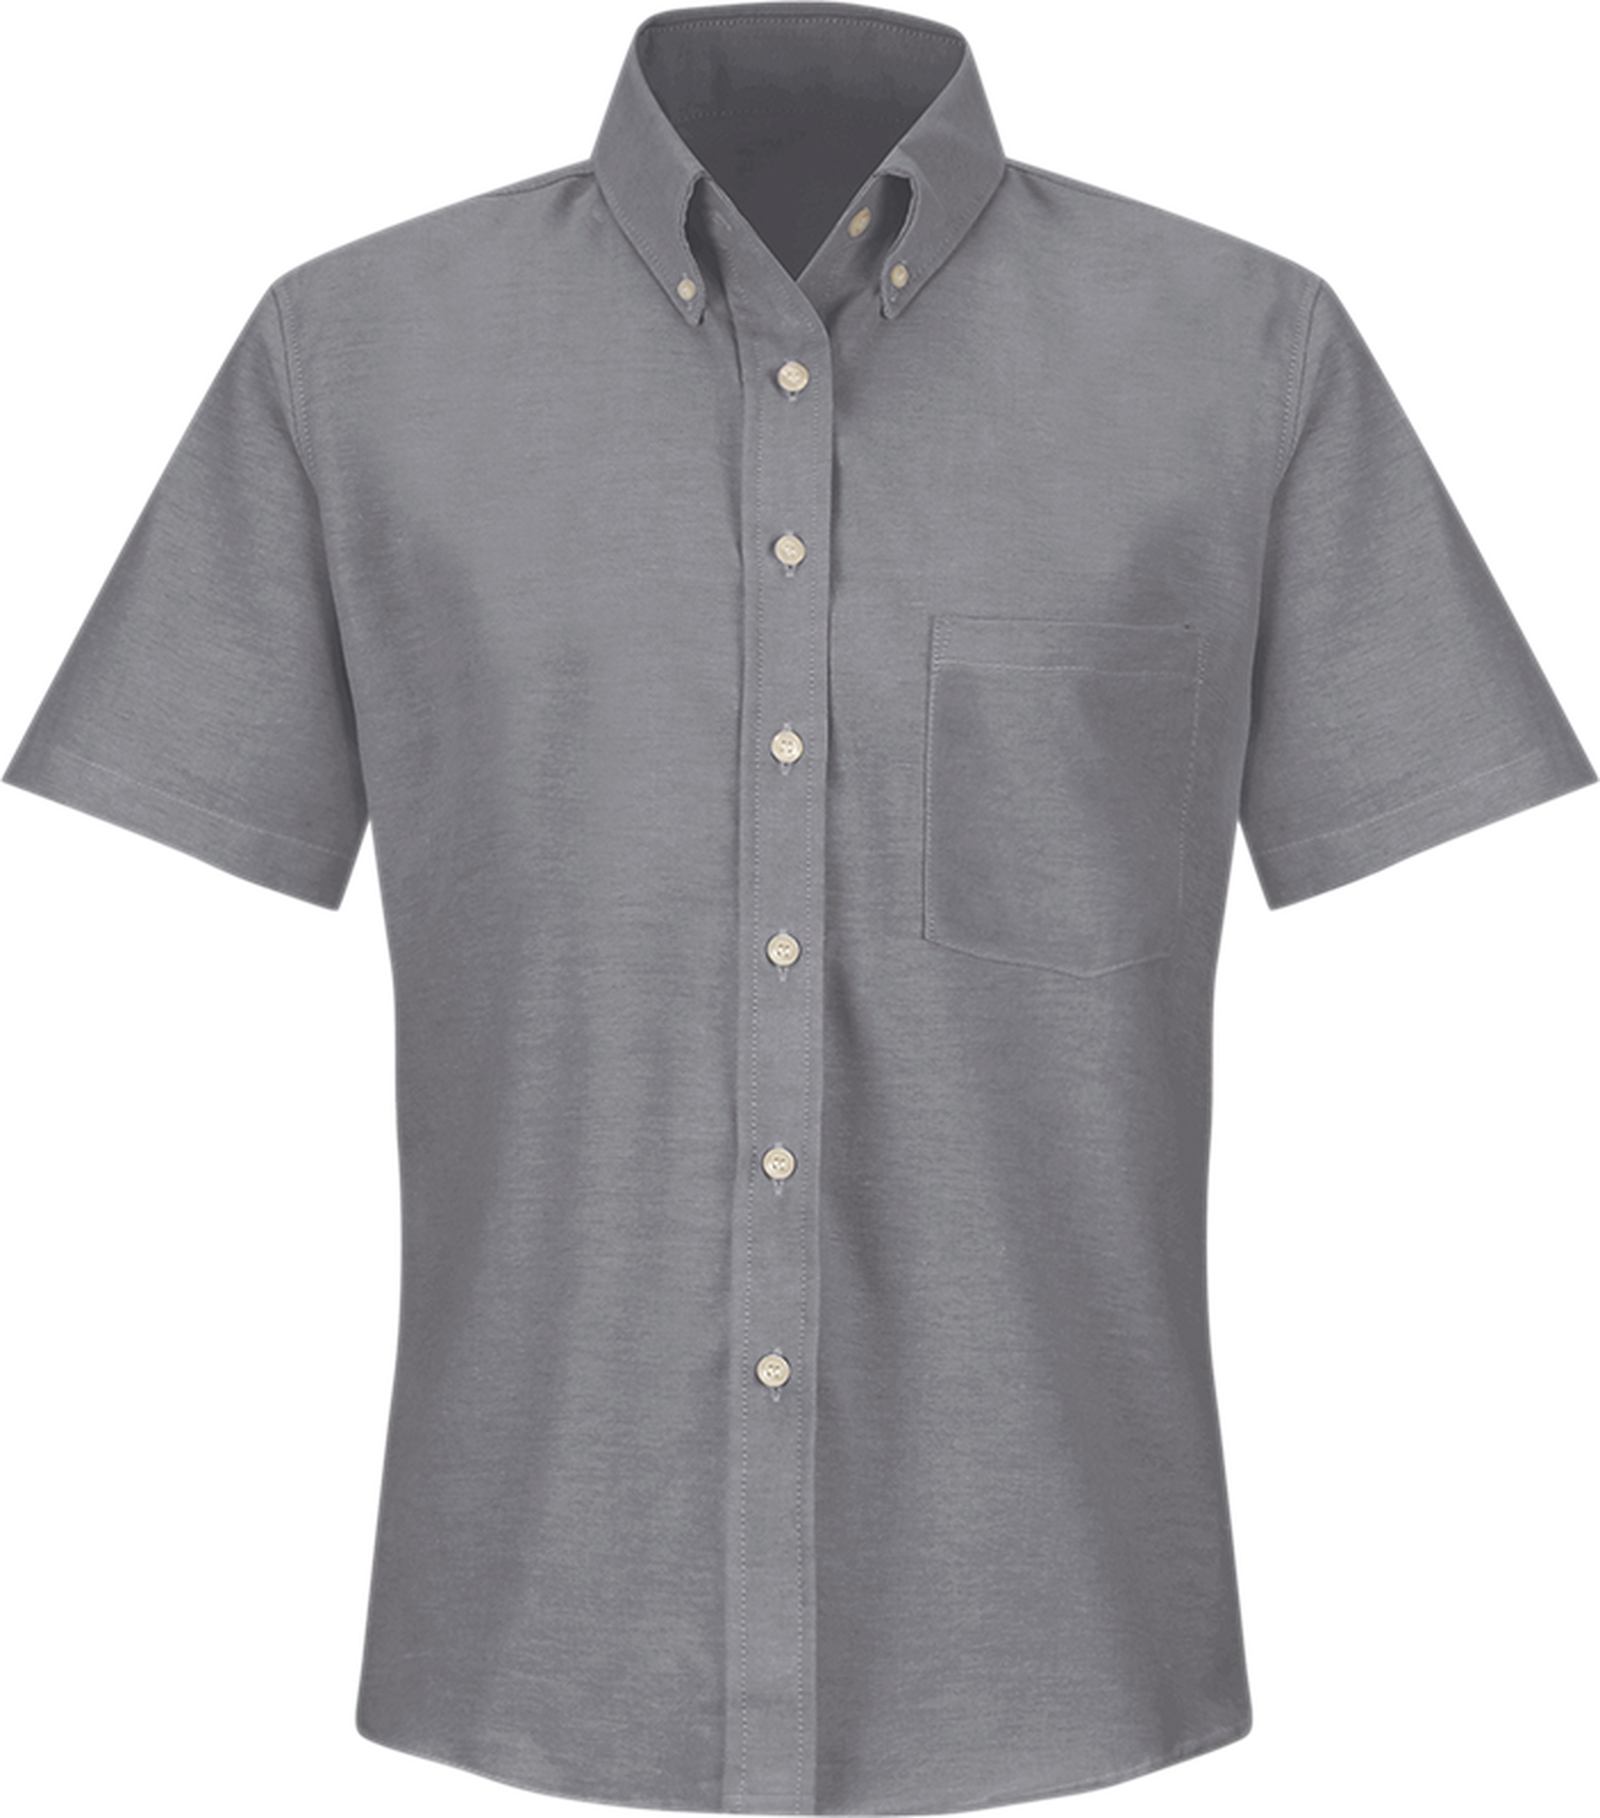 Formal Executive Shirt (Half Sleeve)